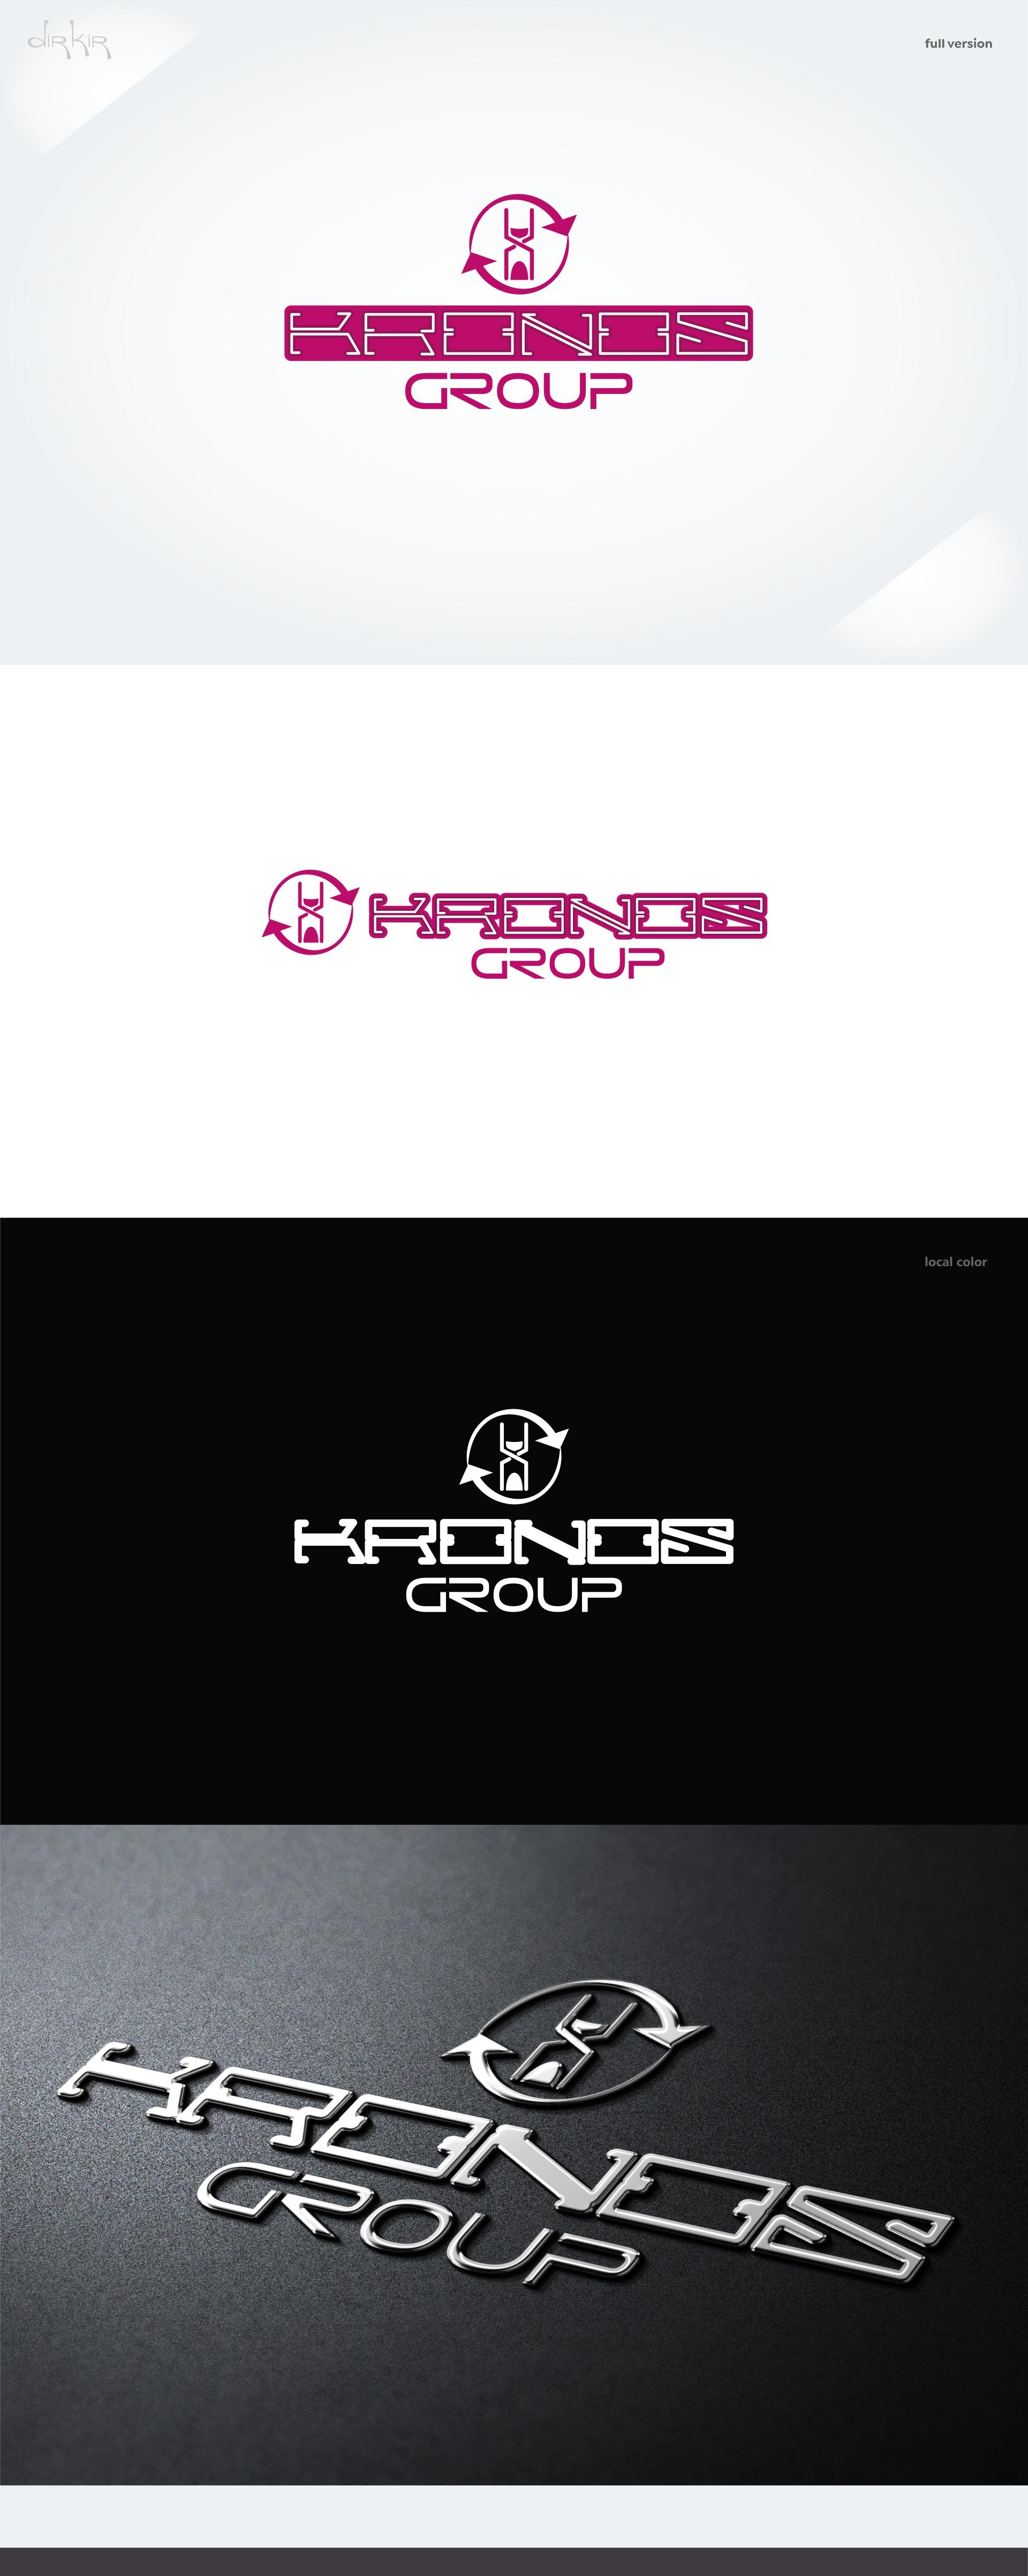 Разработать логотип KRONOS фото f_2075fb4e1981e449.jpg